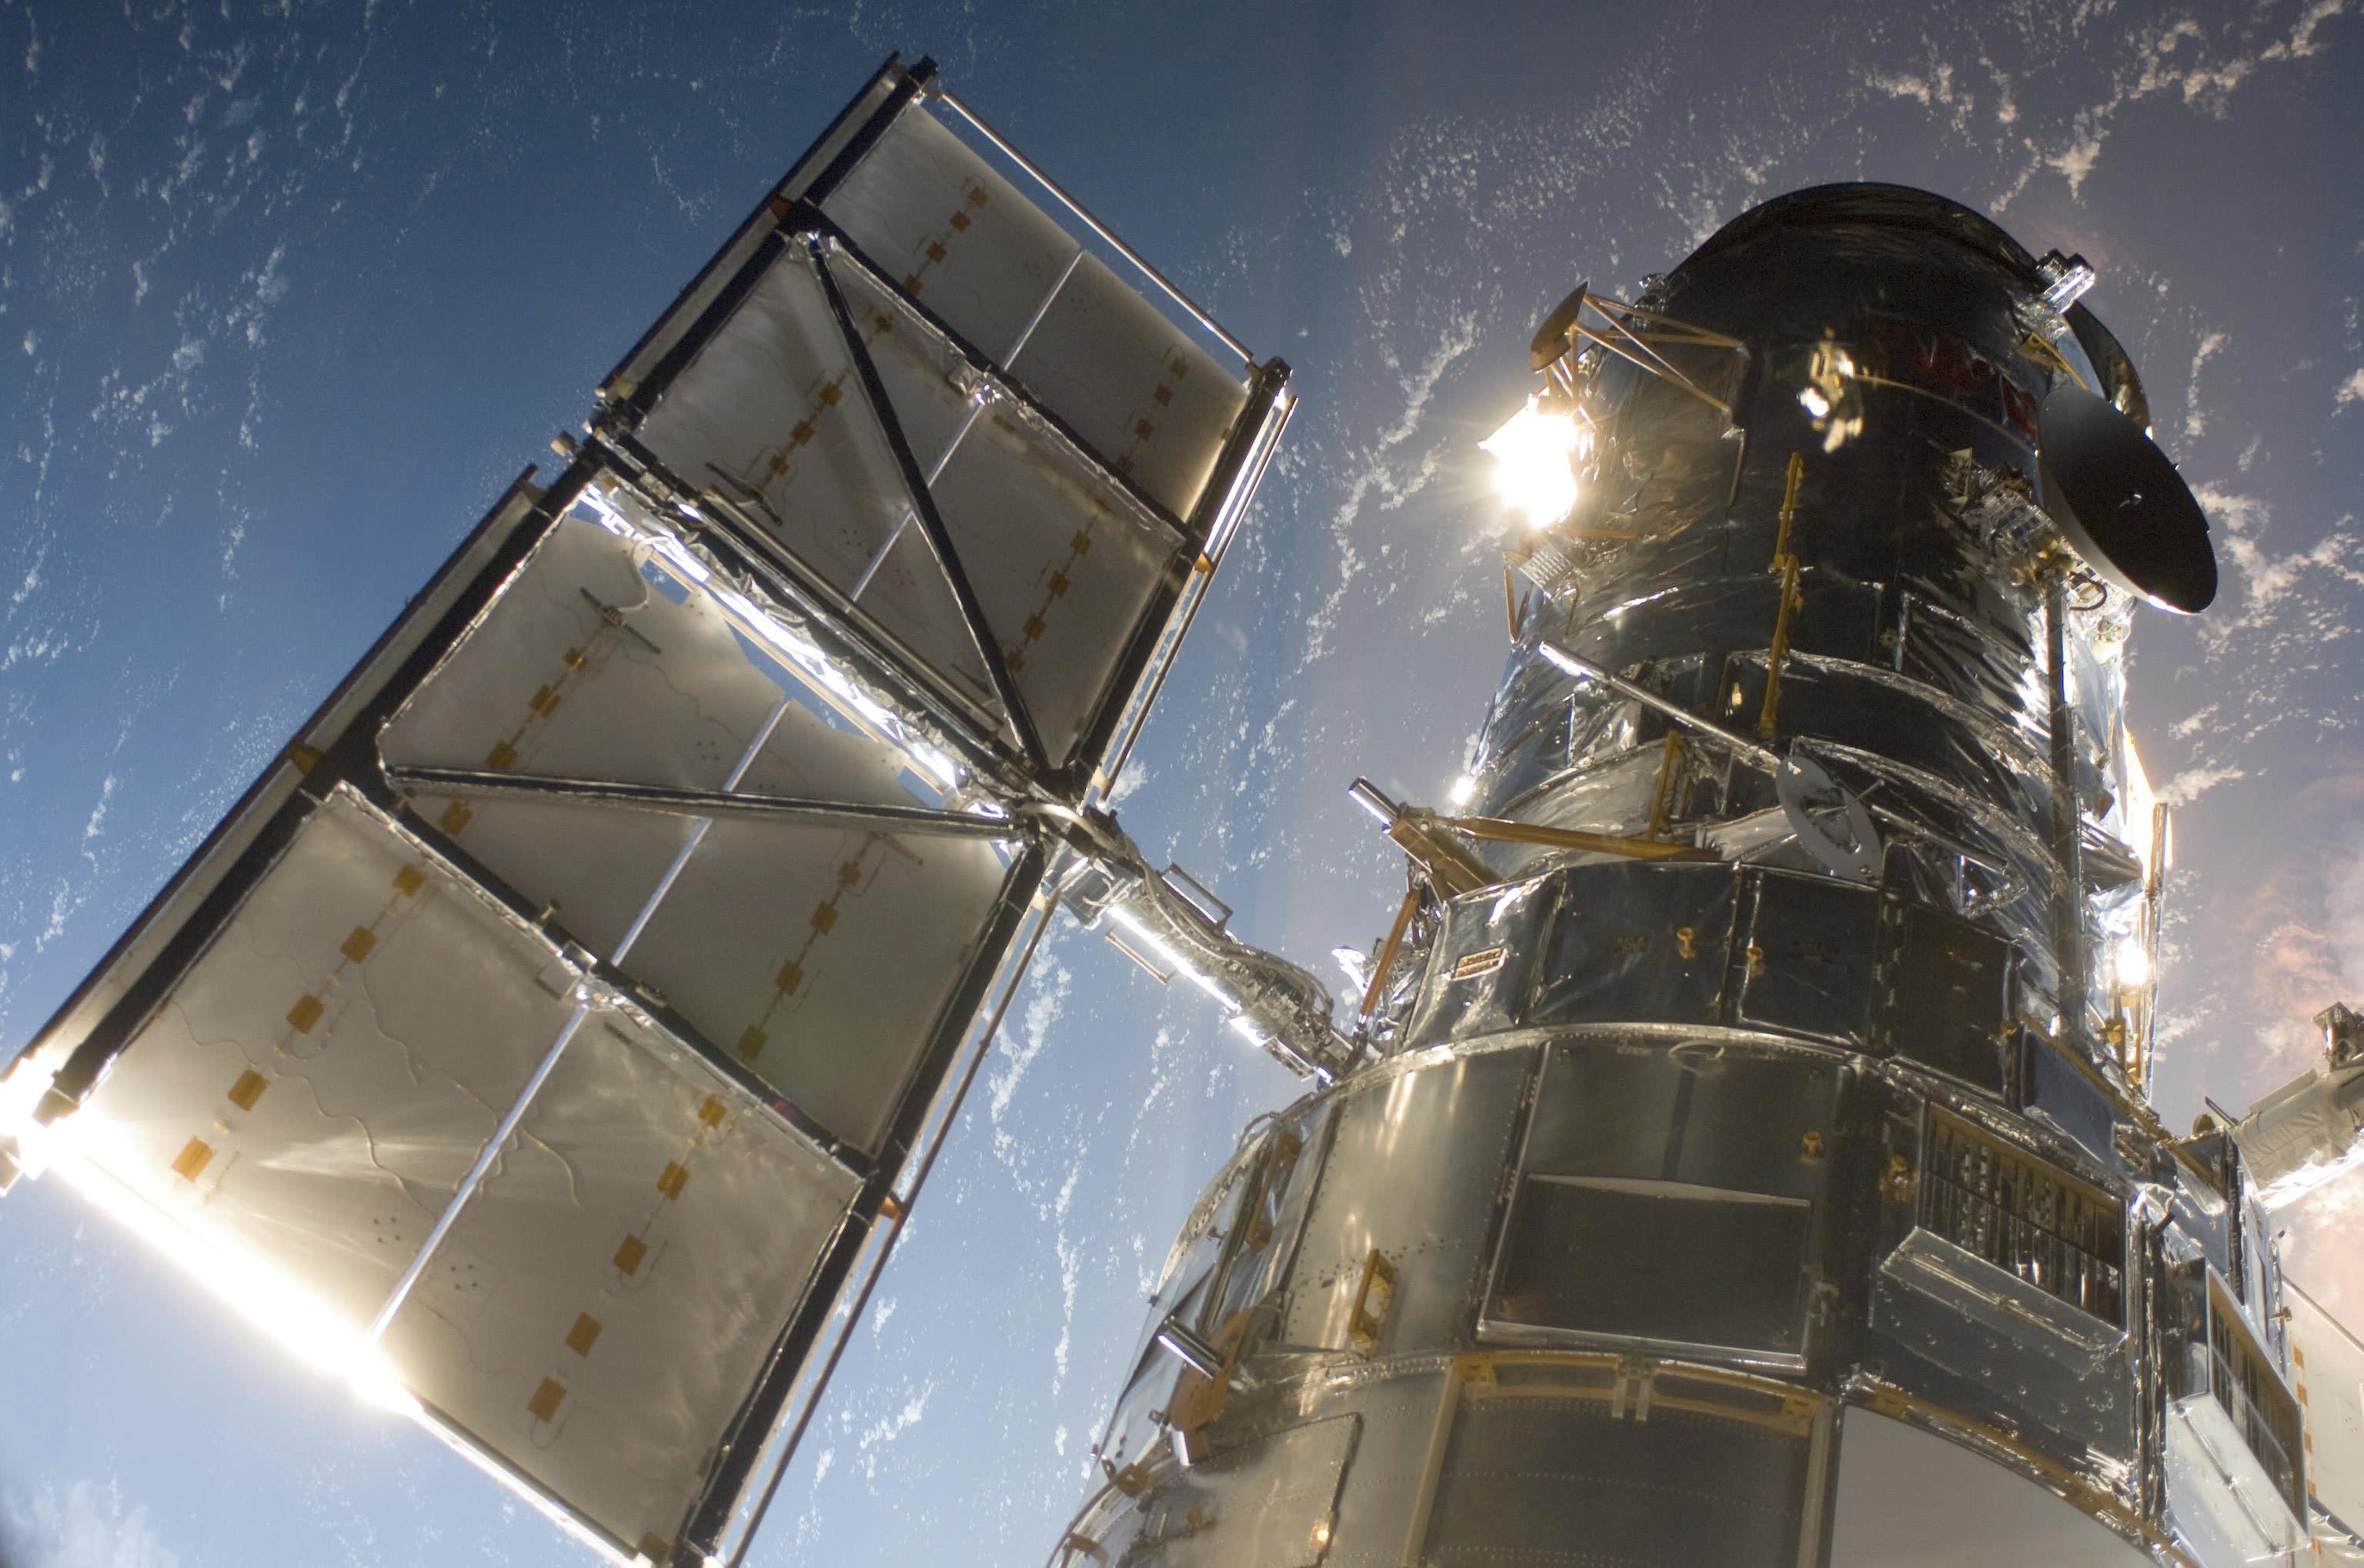 nasa building the hubble space telescope - HD1279×849